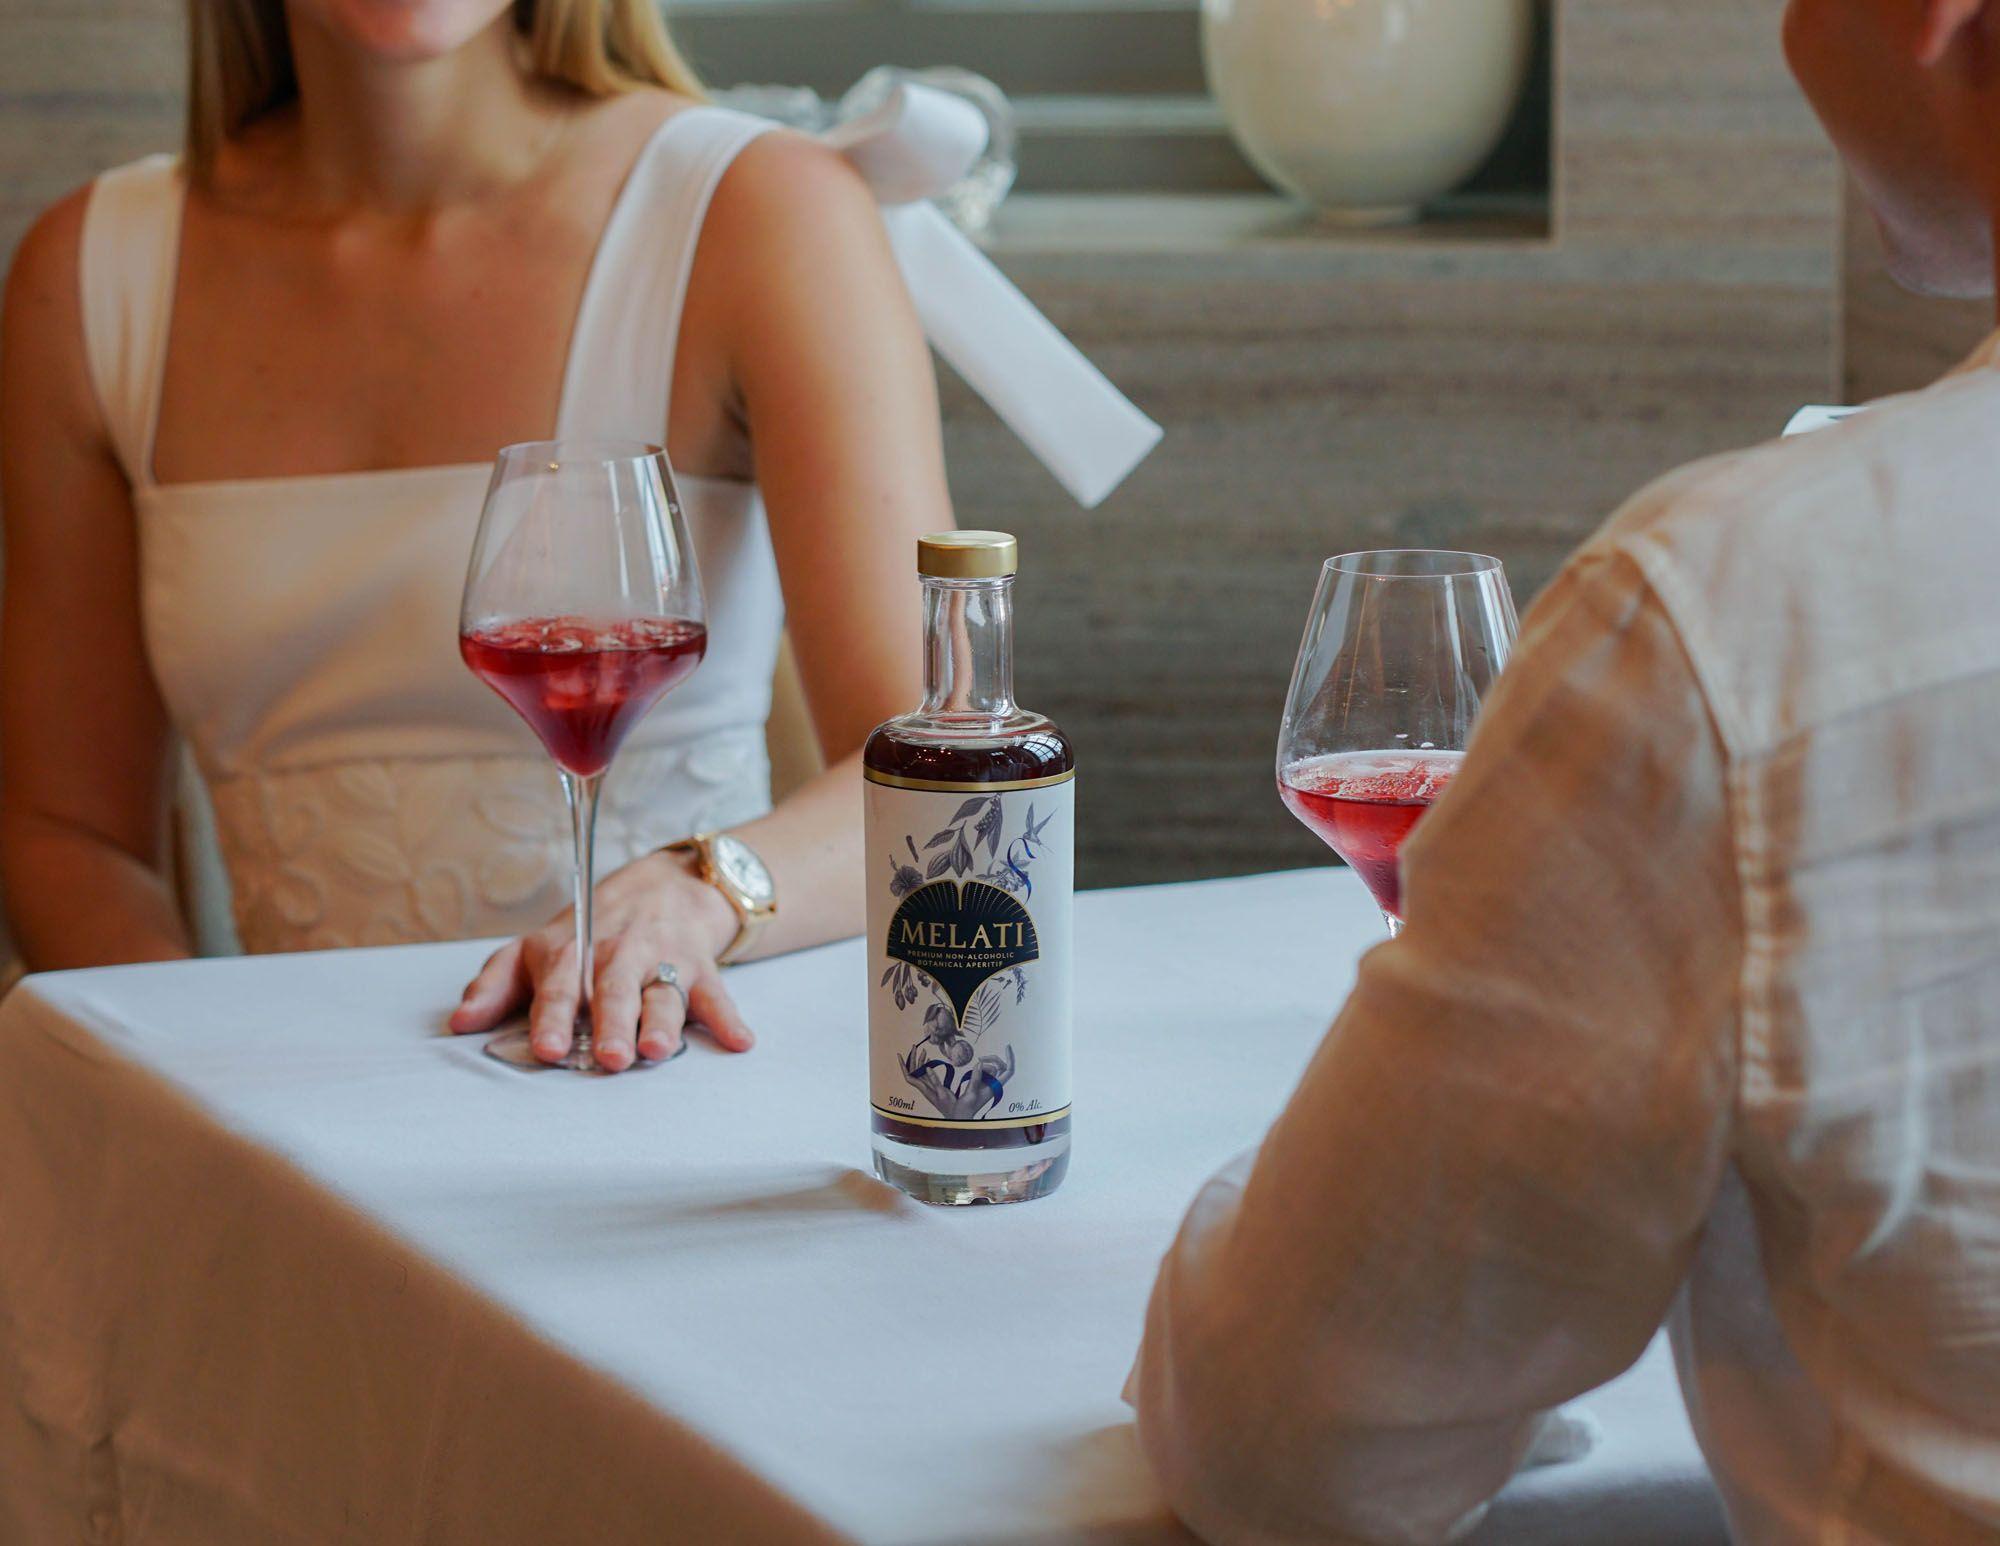 Melati Drinks: Singaporean Founder Lorin Winata on Why She Created a Non-Alcoholic Aperitif